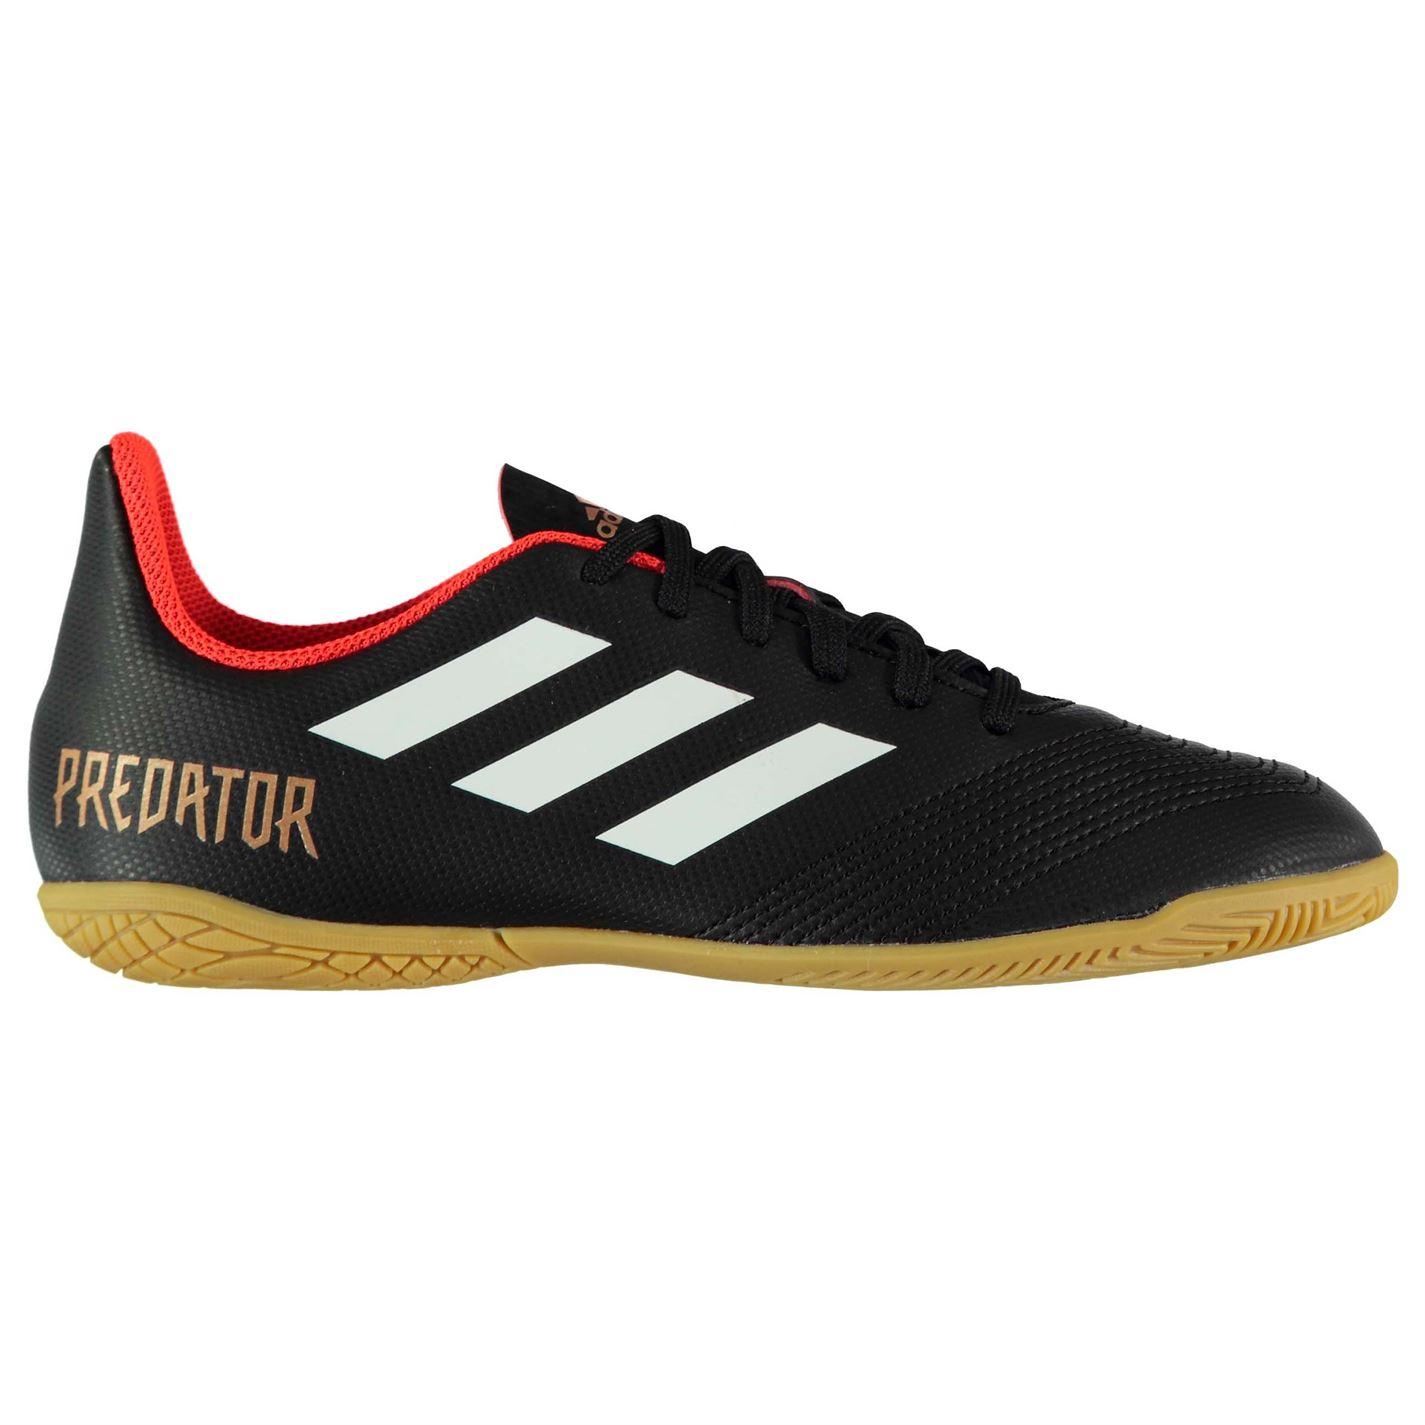 6f35dc2e2 Adidas Predator Tango 18.4 Junior Indoor Football Trainers